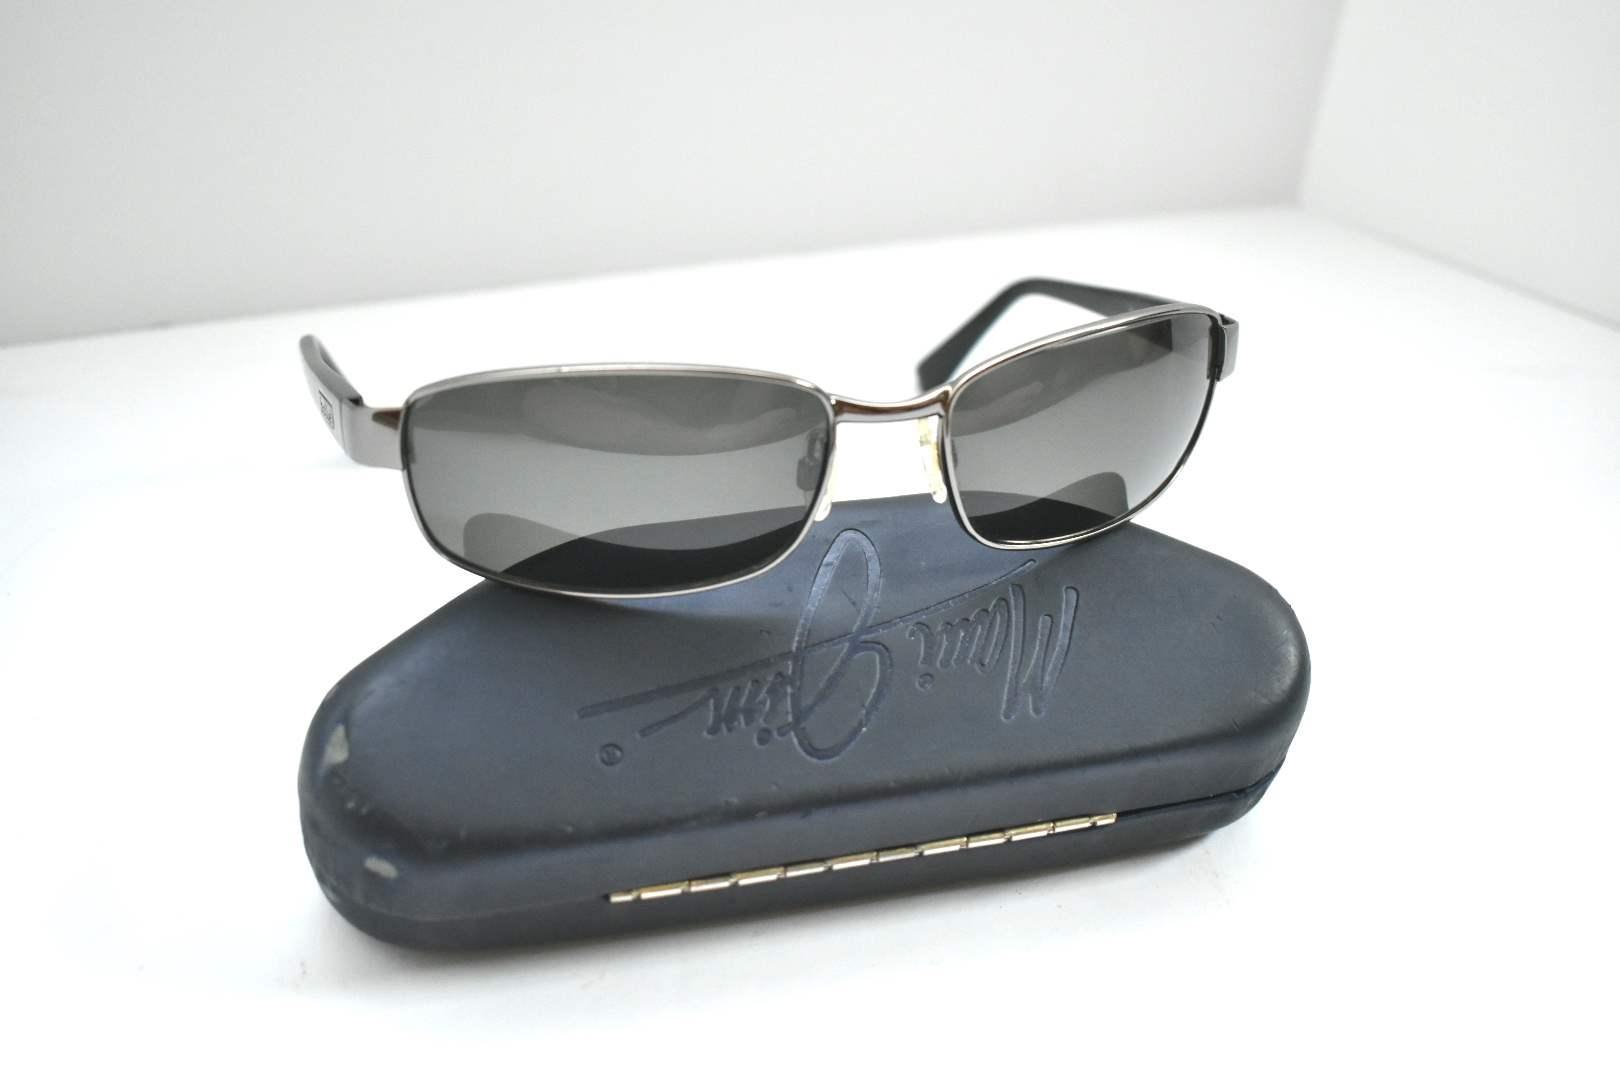 Bollé Sunglasses in Jim Maui Case